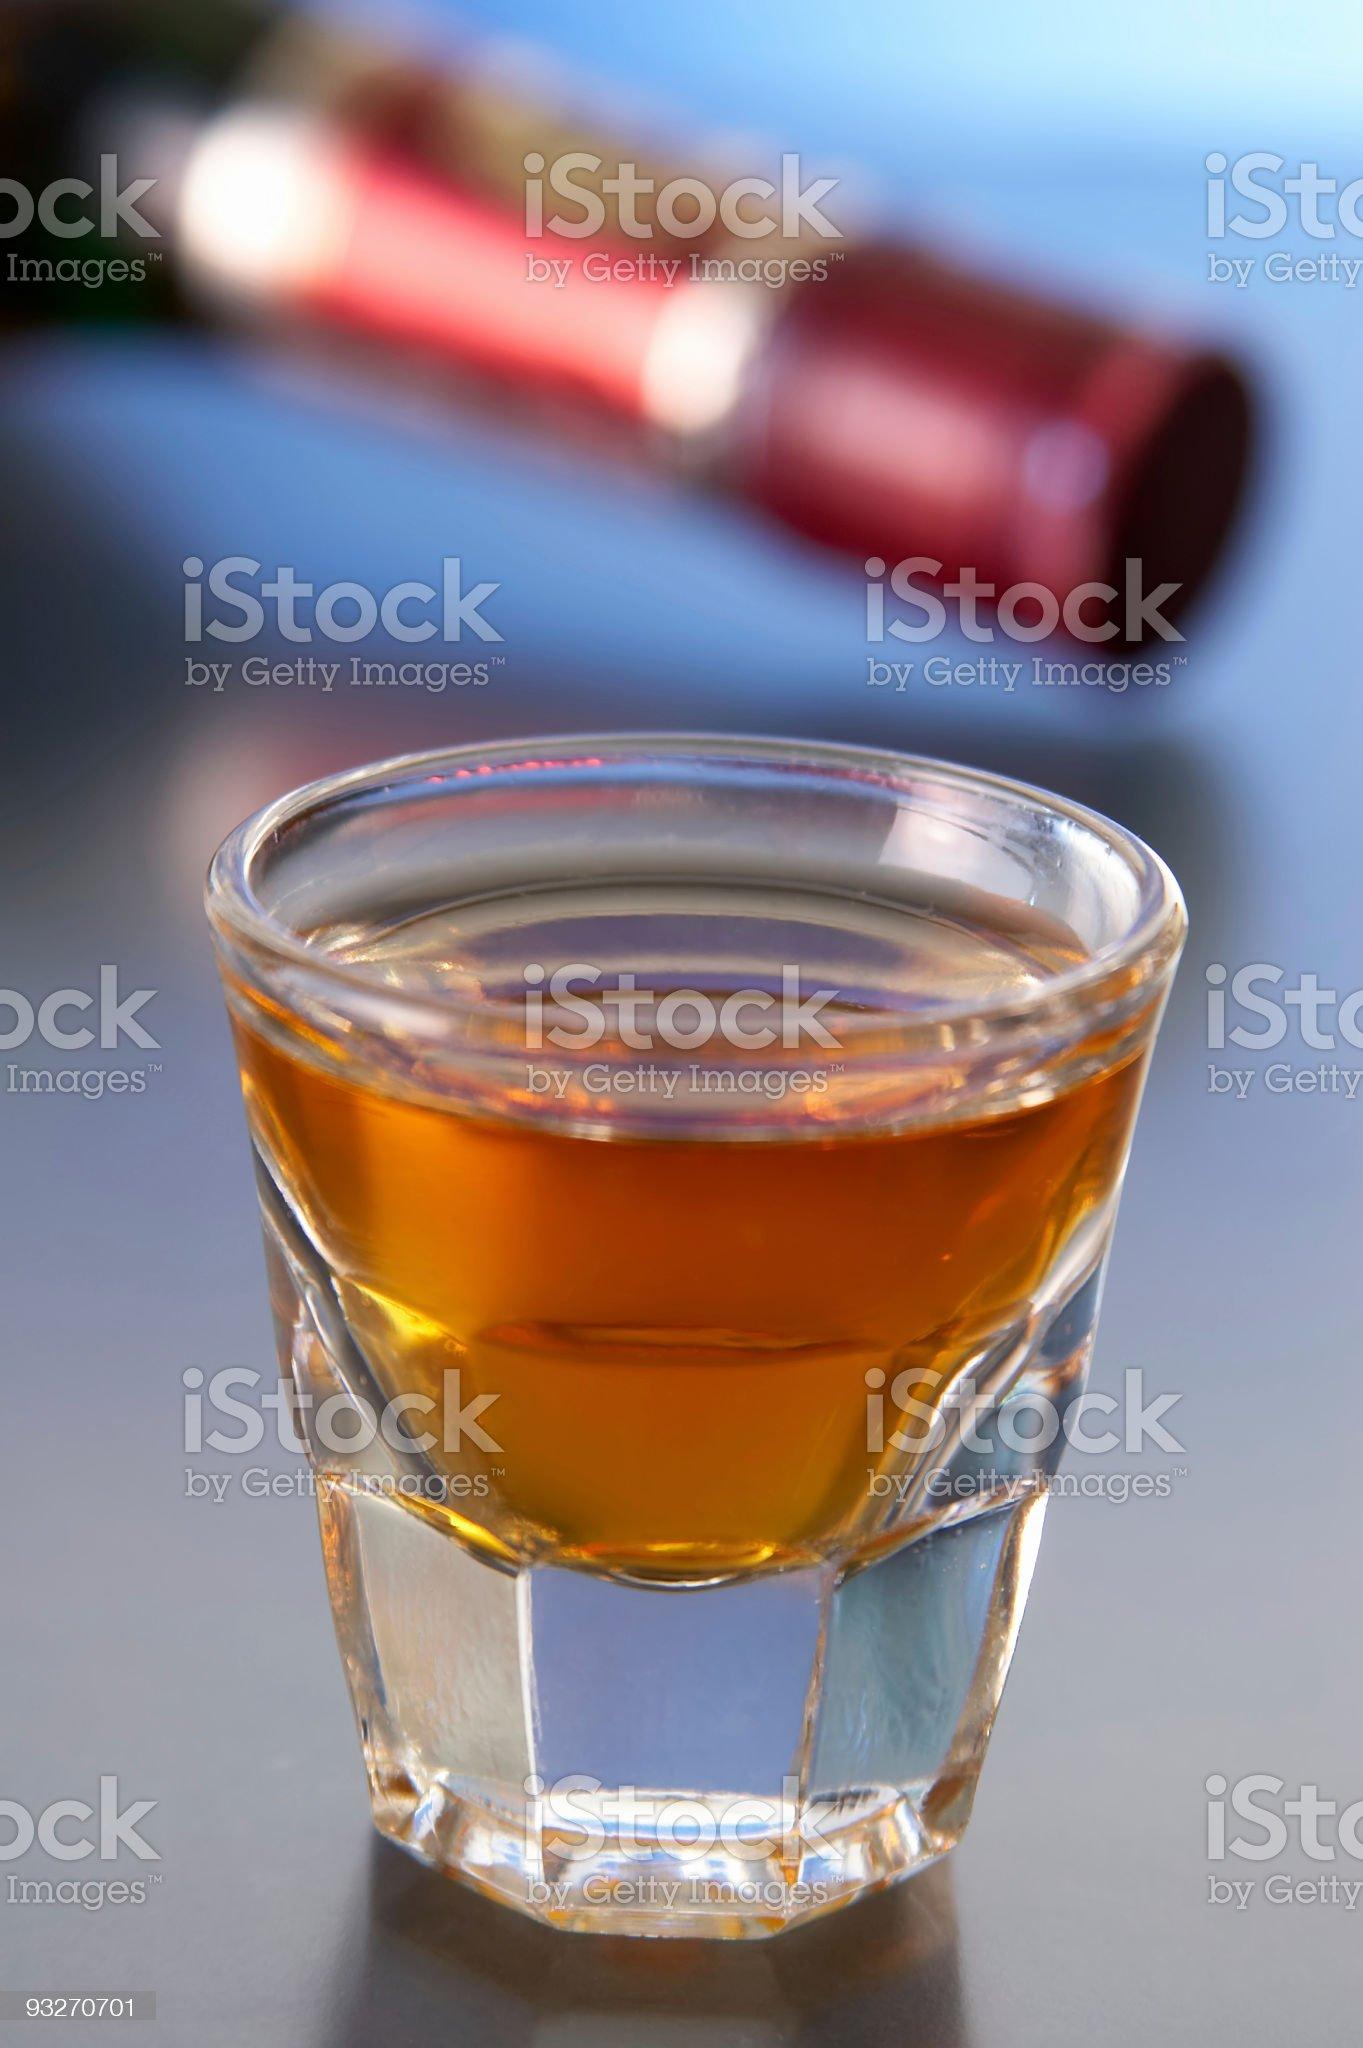 Bottle of Booze royalty-free stock photo